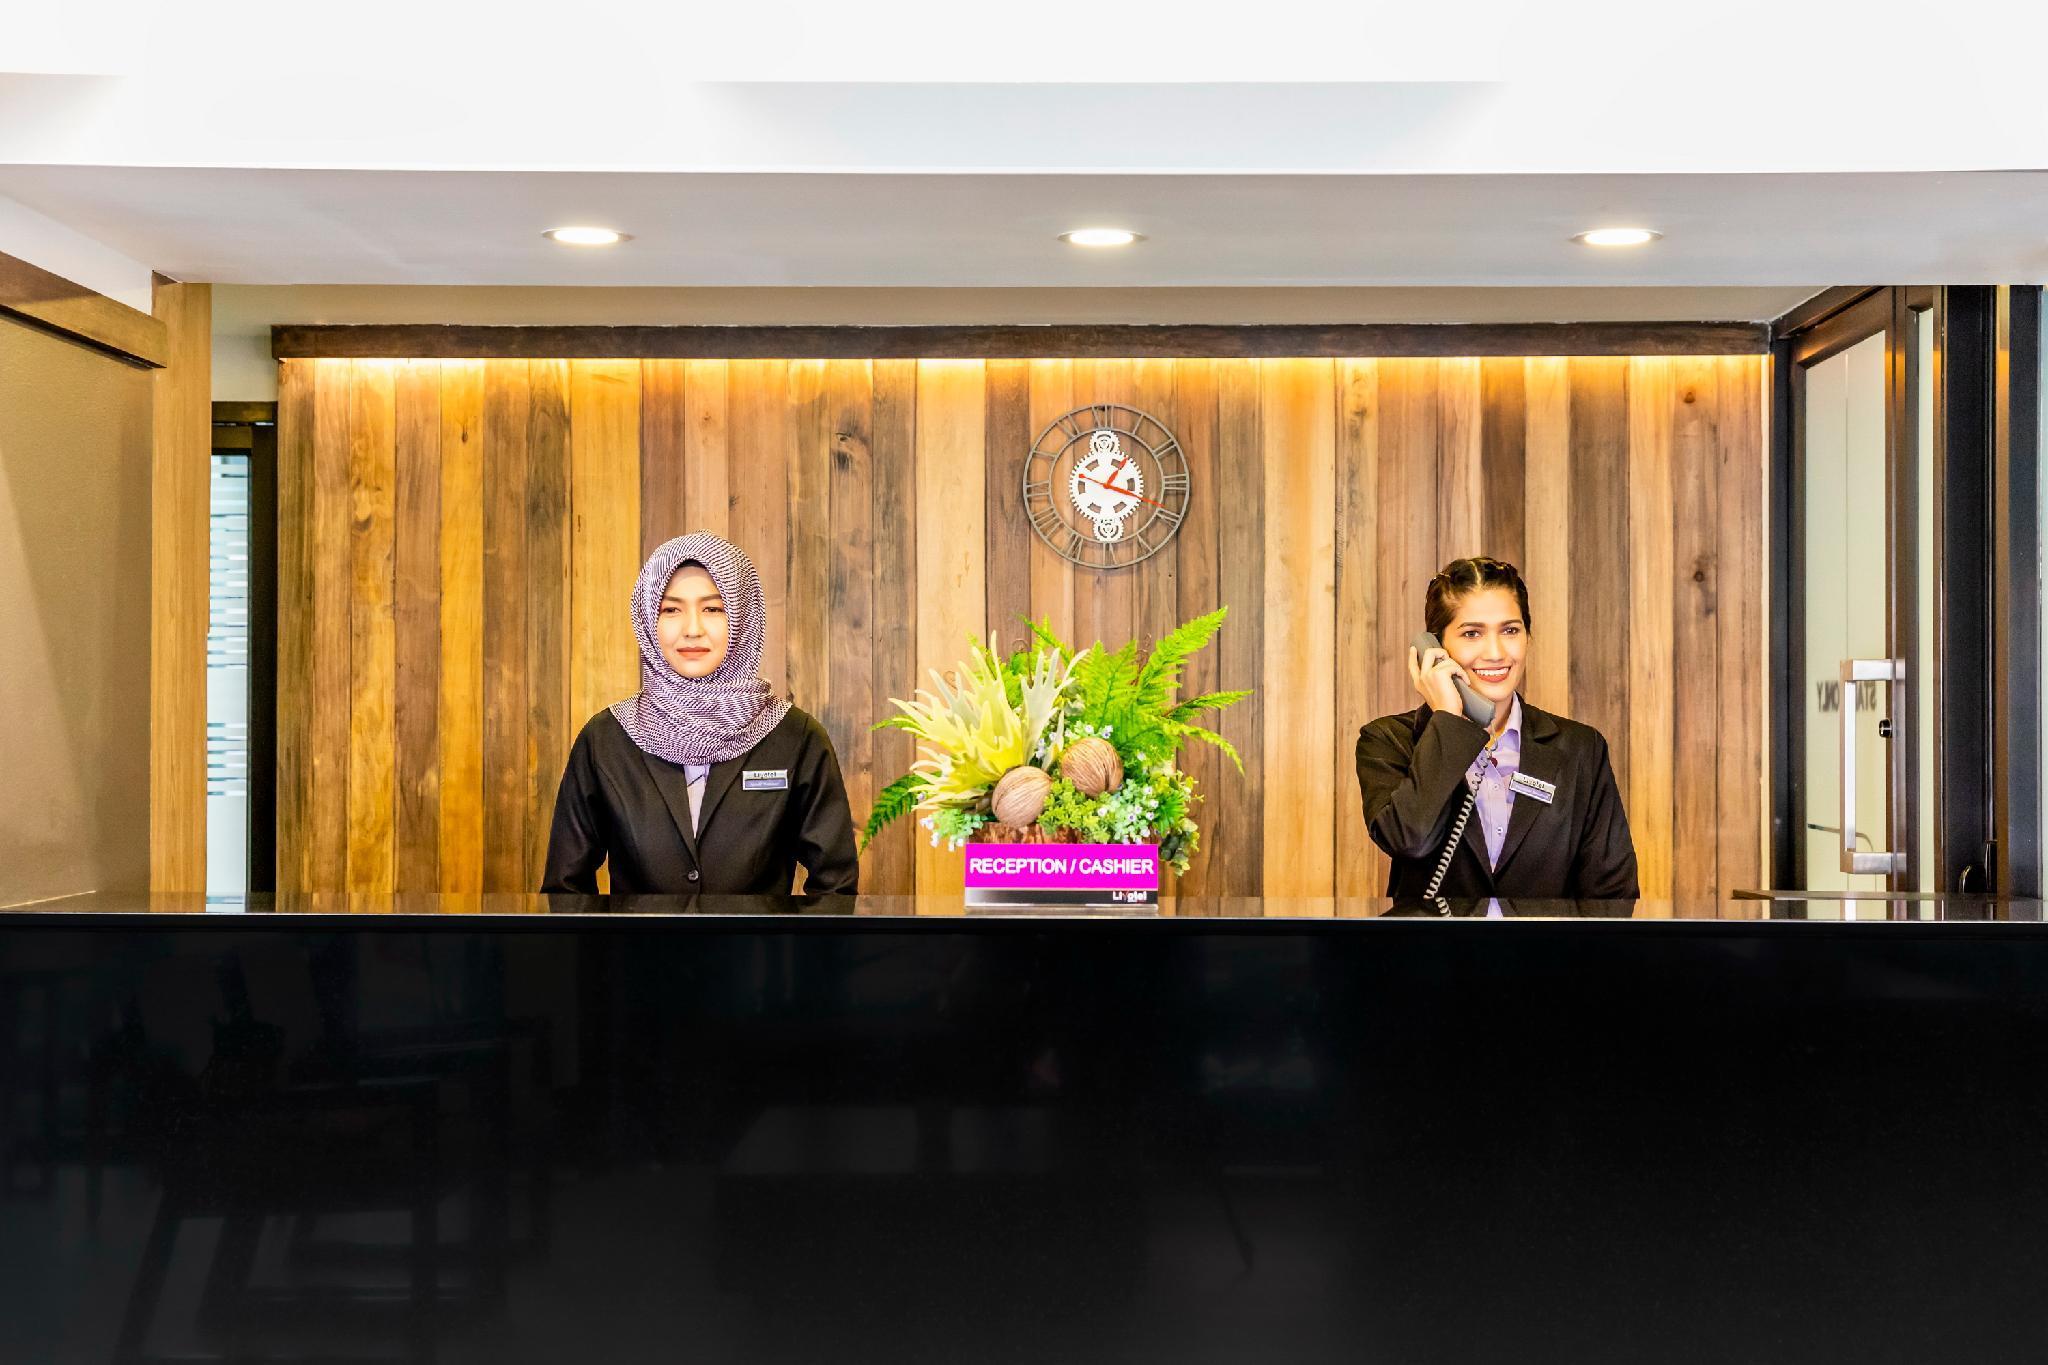 Livotel Express Hotel Ramkhamhaeng 50 Bangkok